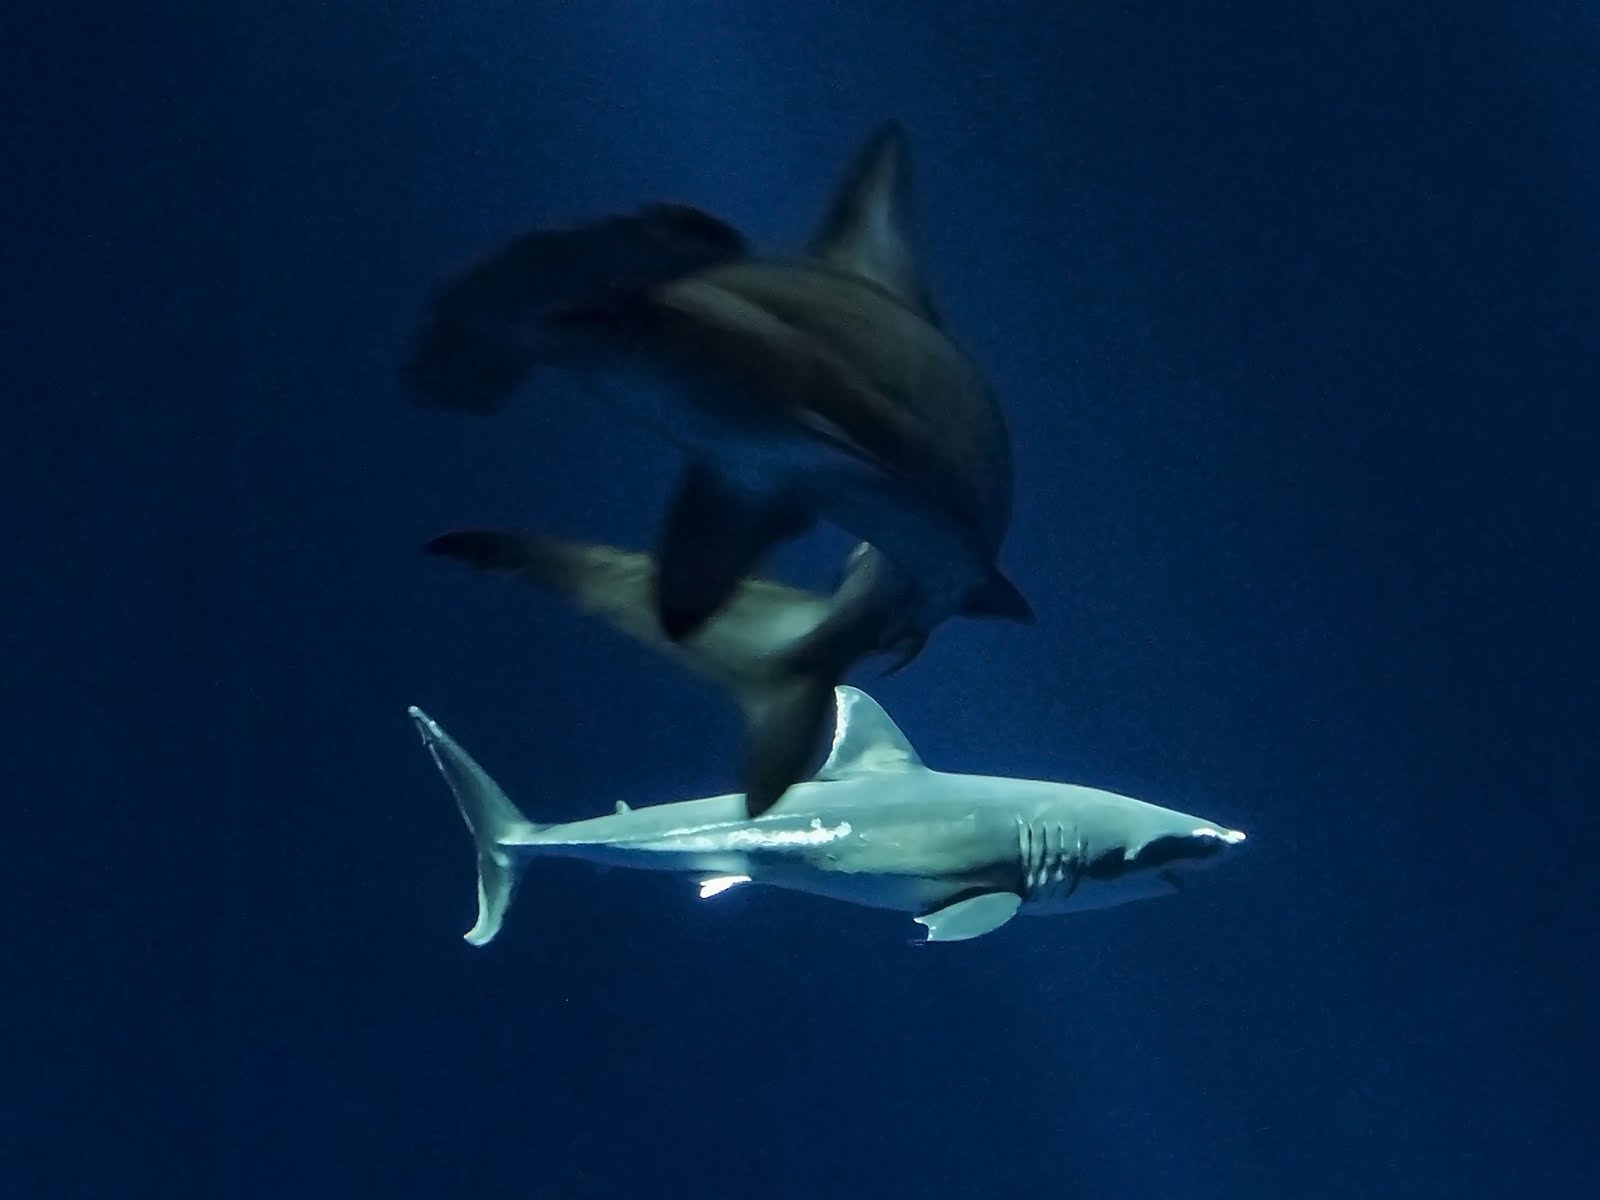 Precise Moments in Time: Great White Shark @ Monterey Aquarium